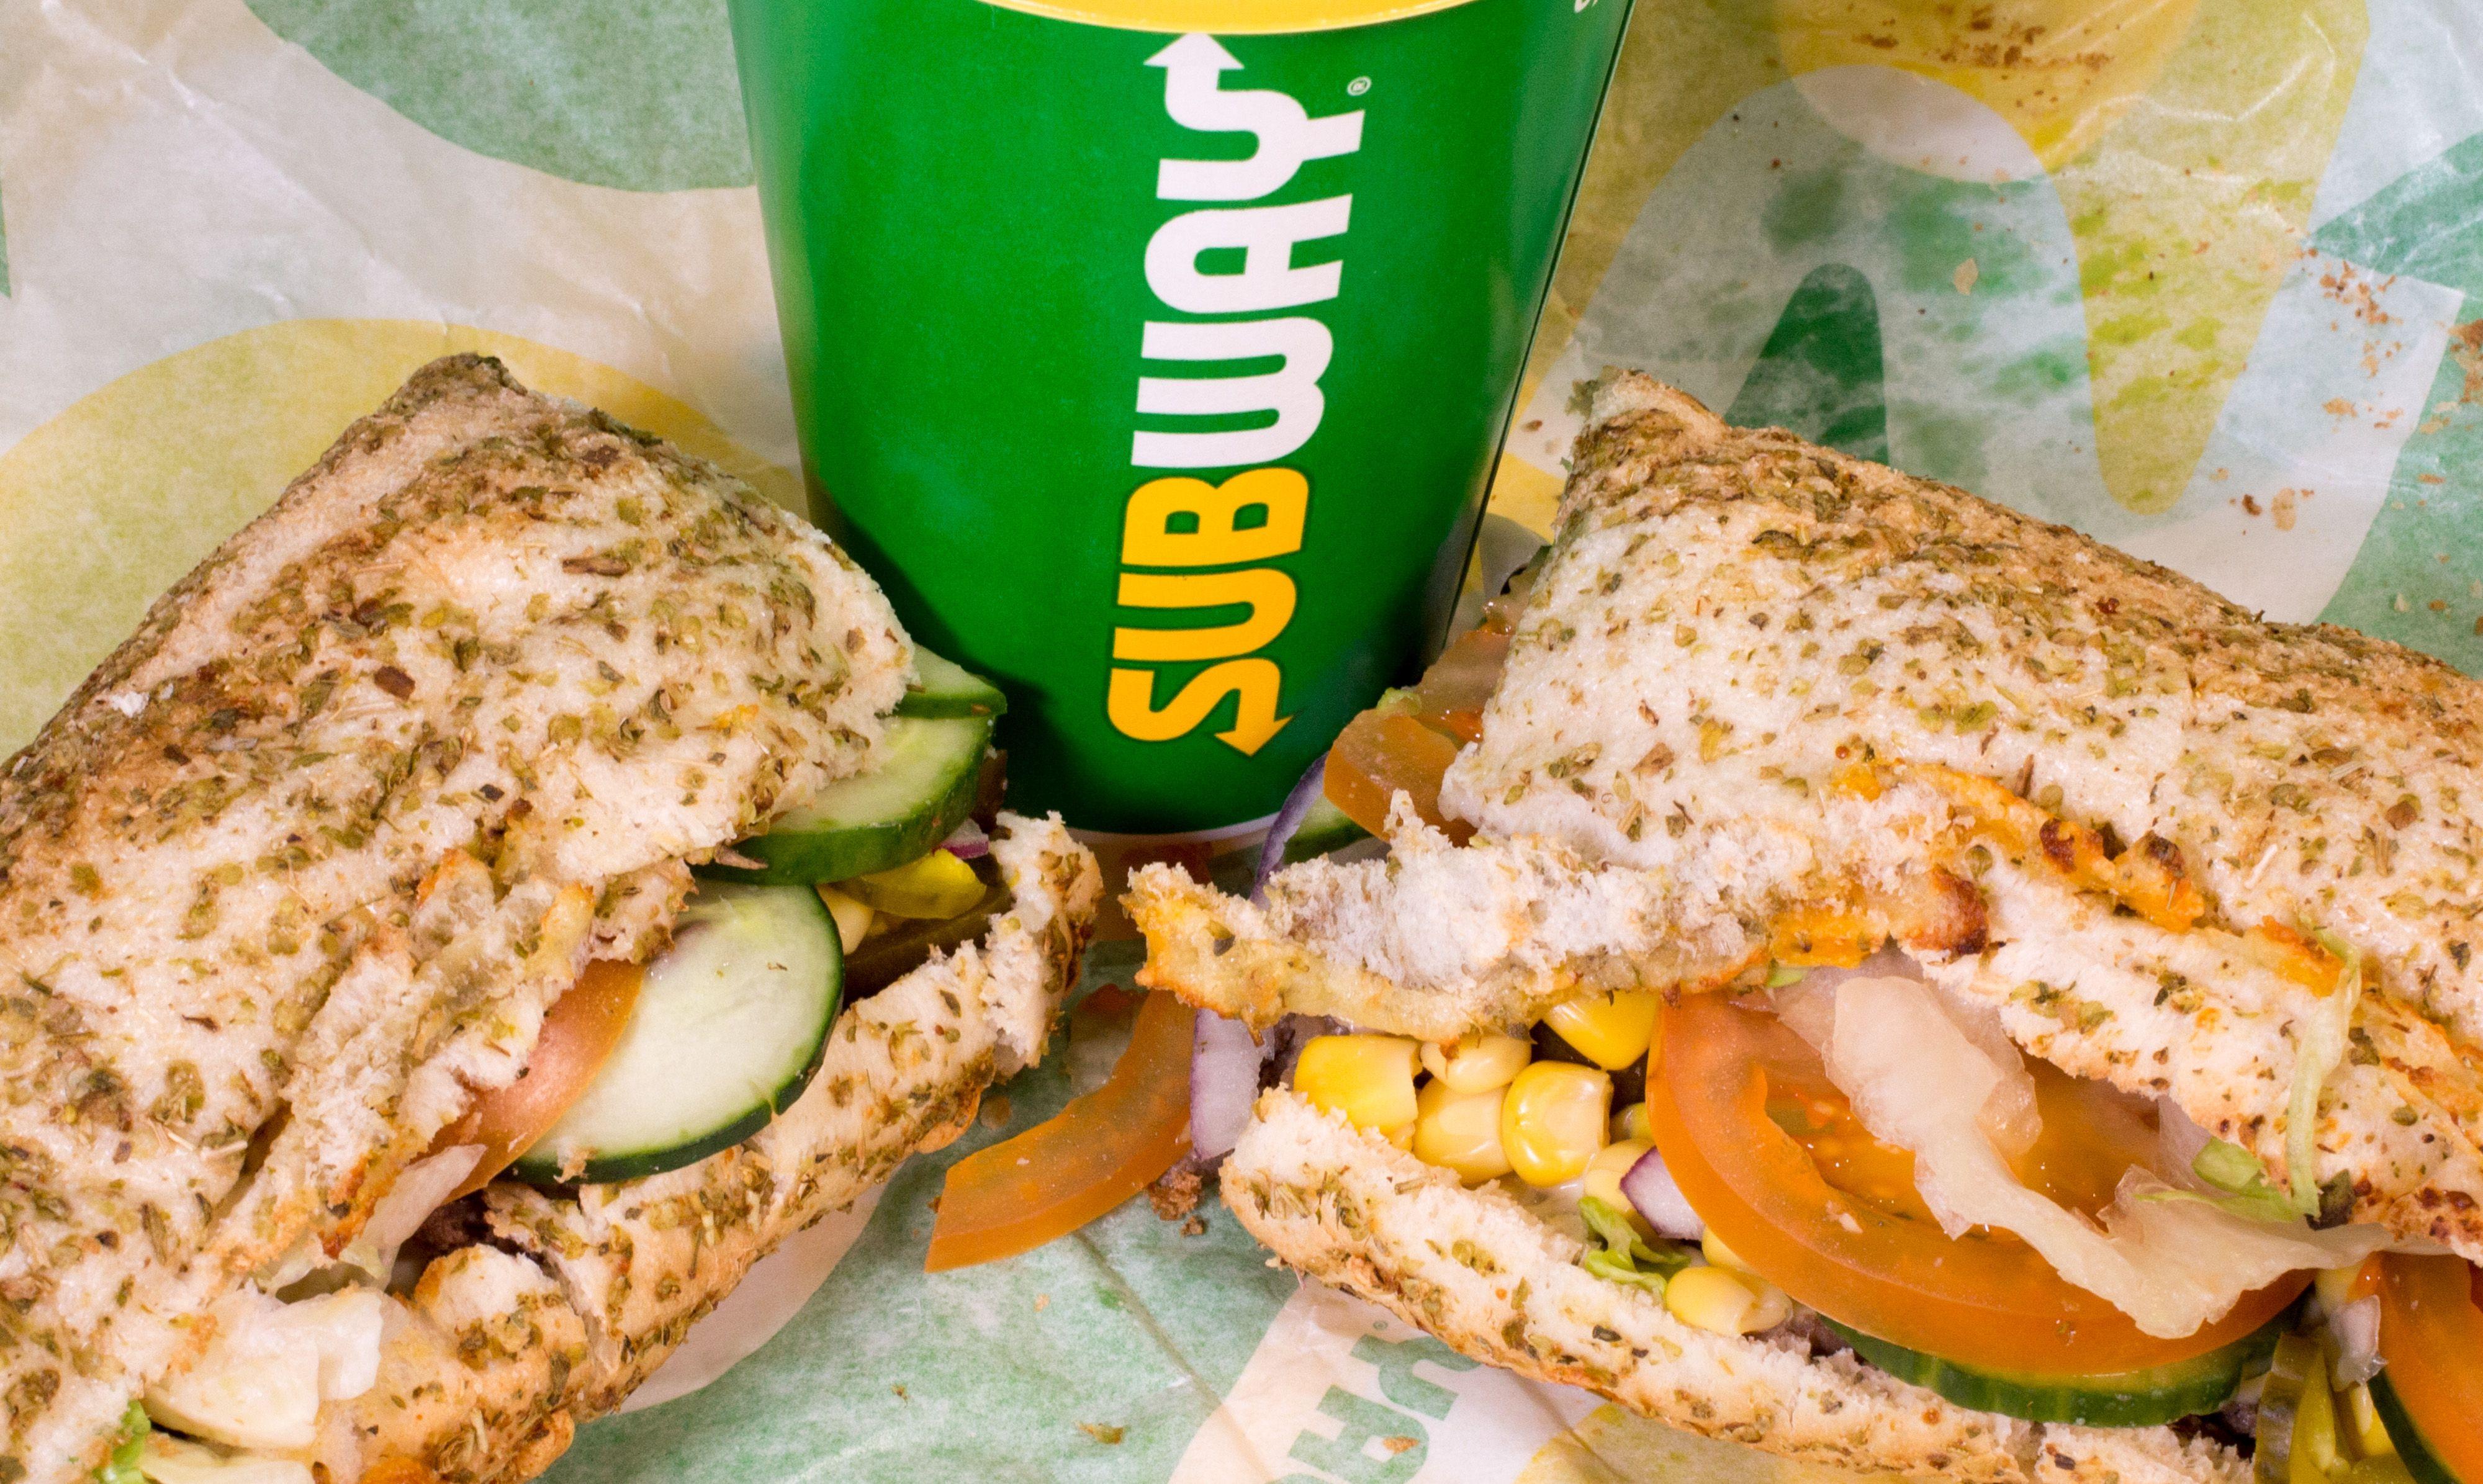 How To Eat Vegan At Subway - Subway